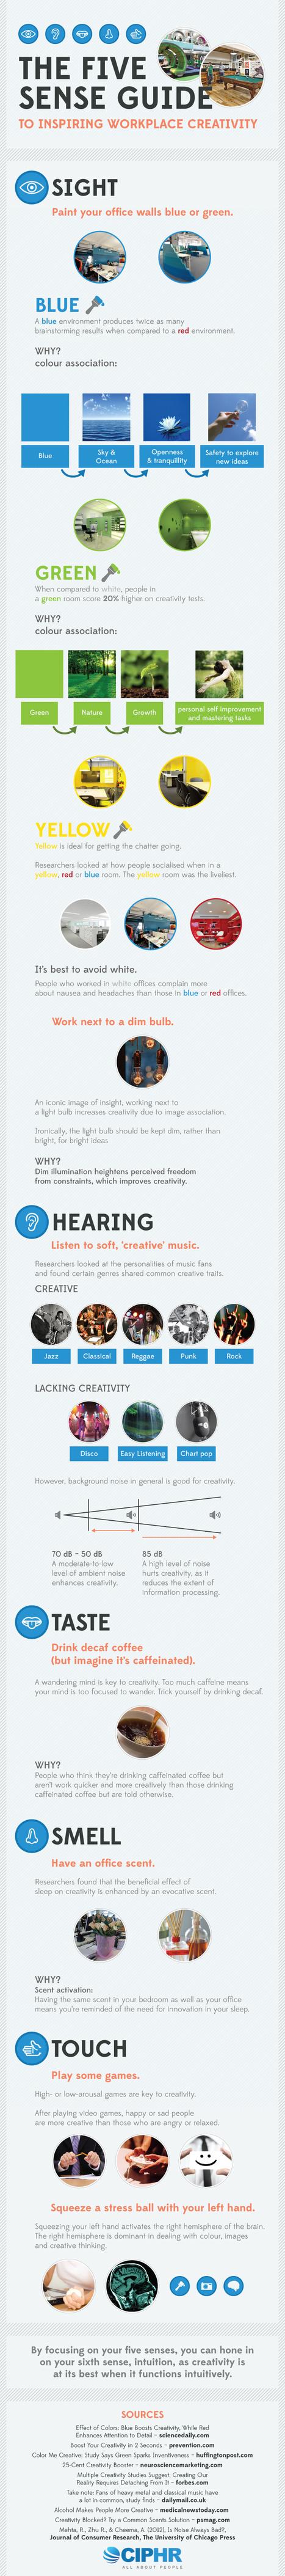 Inspiring Workplace Creativity Through the Five Senses | Organisation Development | Scoop.it